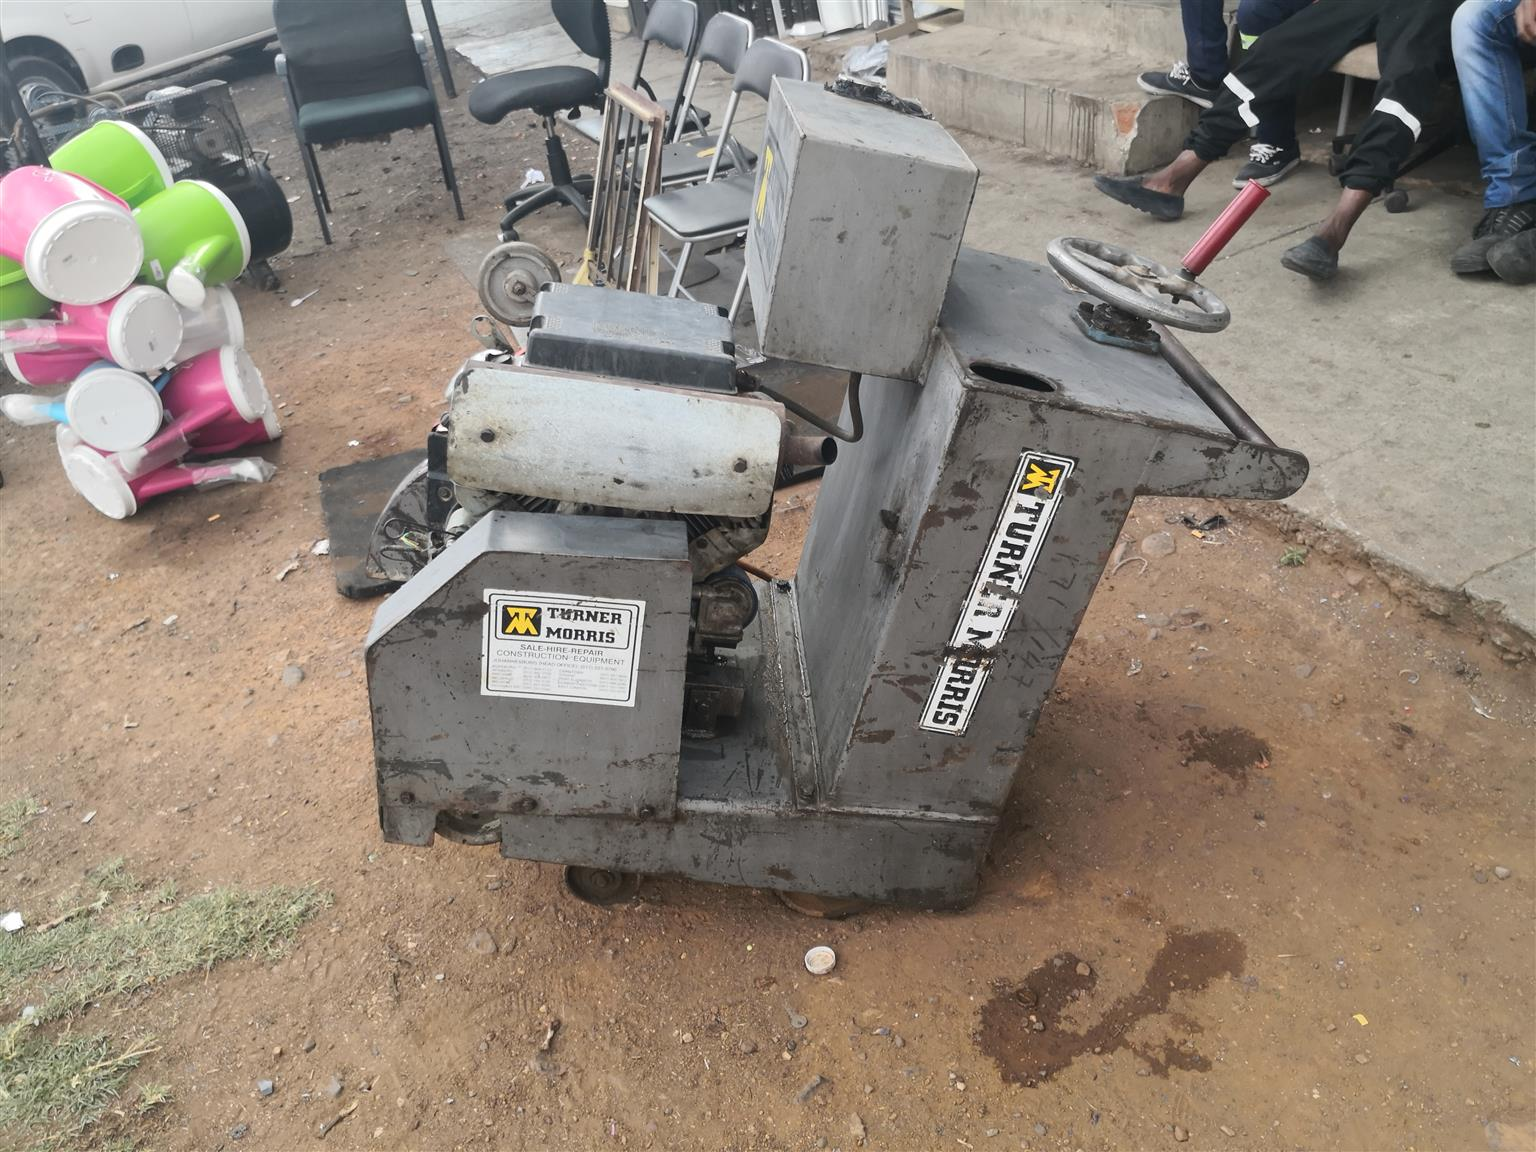 Turner morris concrete saw